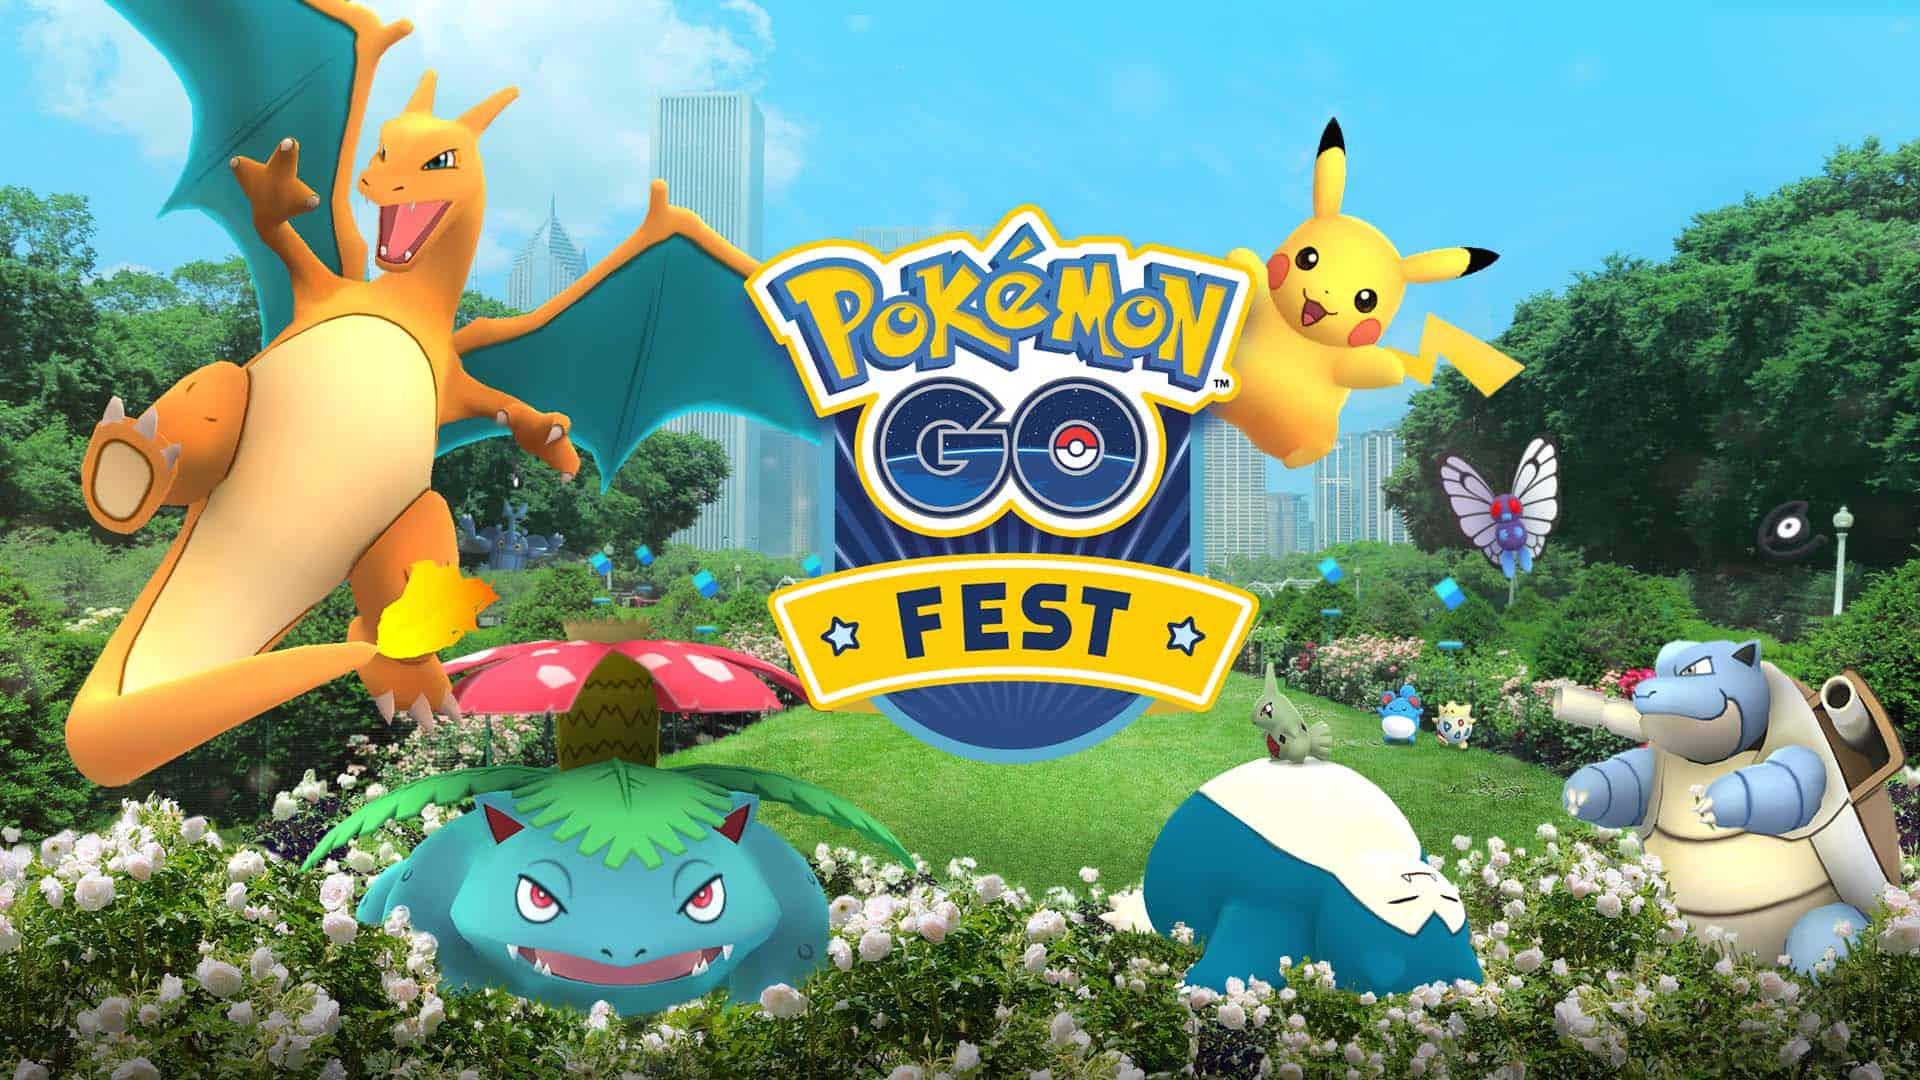 Pokémon-GO-fest